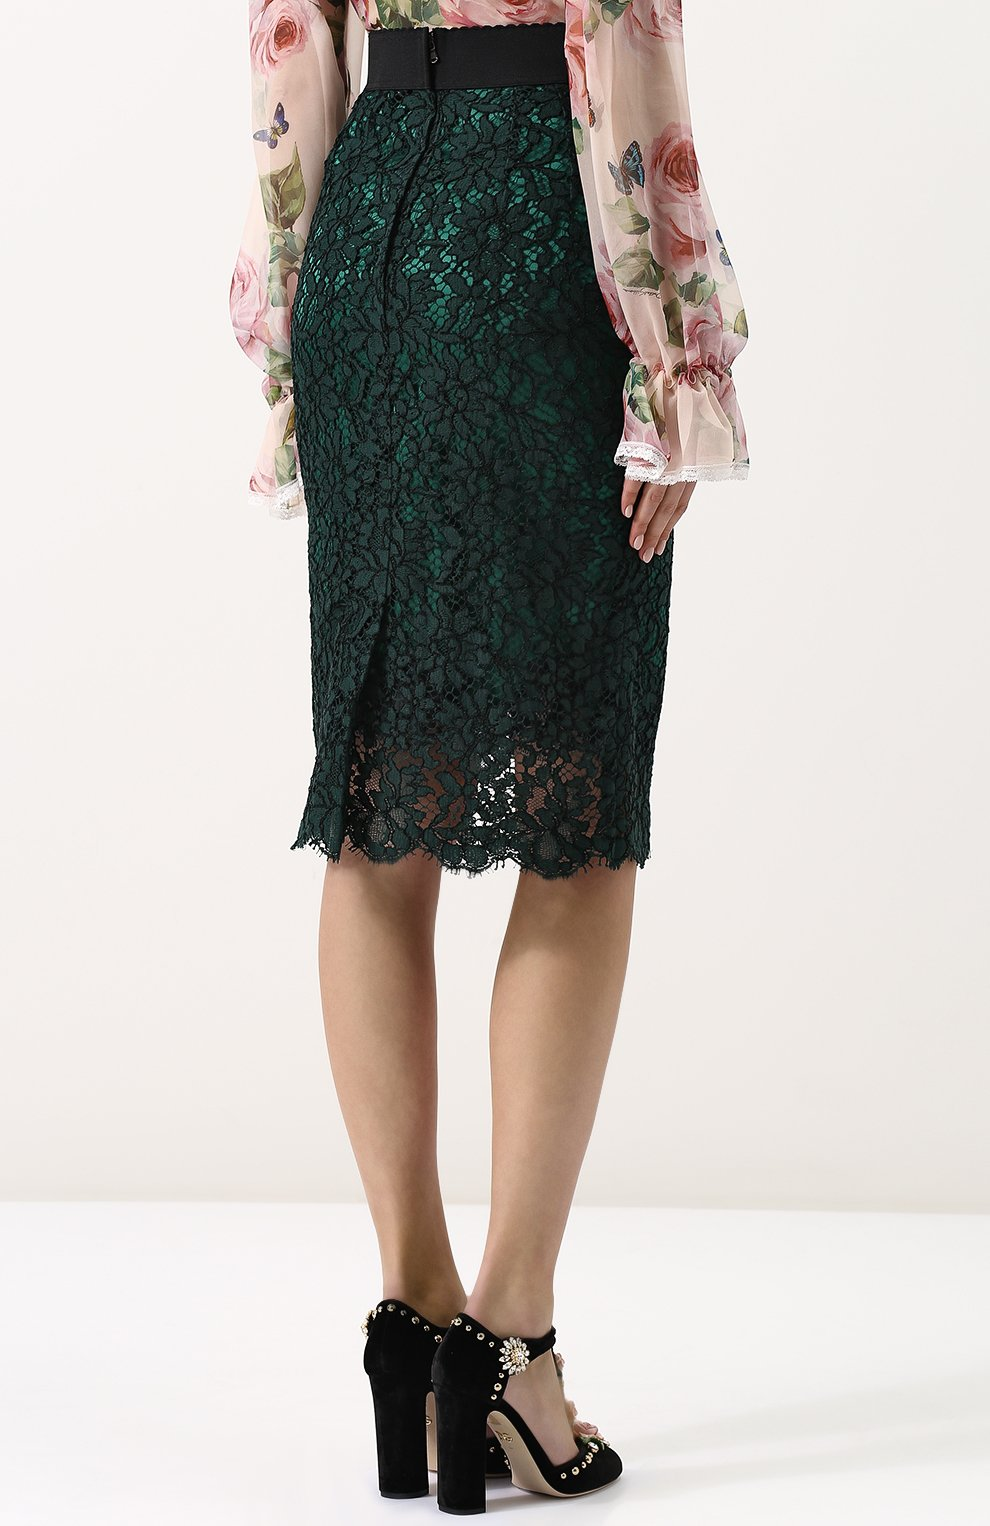 Кружевная юбка-миди с широким поясом | Фото №4